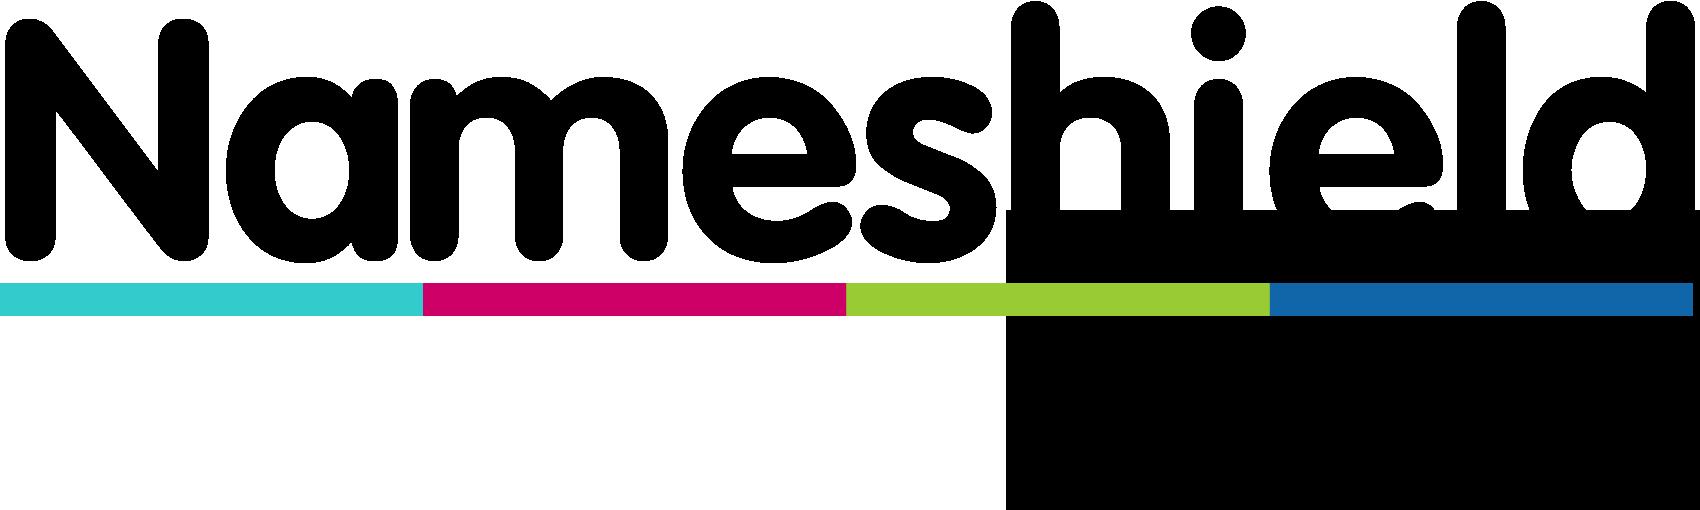 Nms Logo Rvb Fw